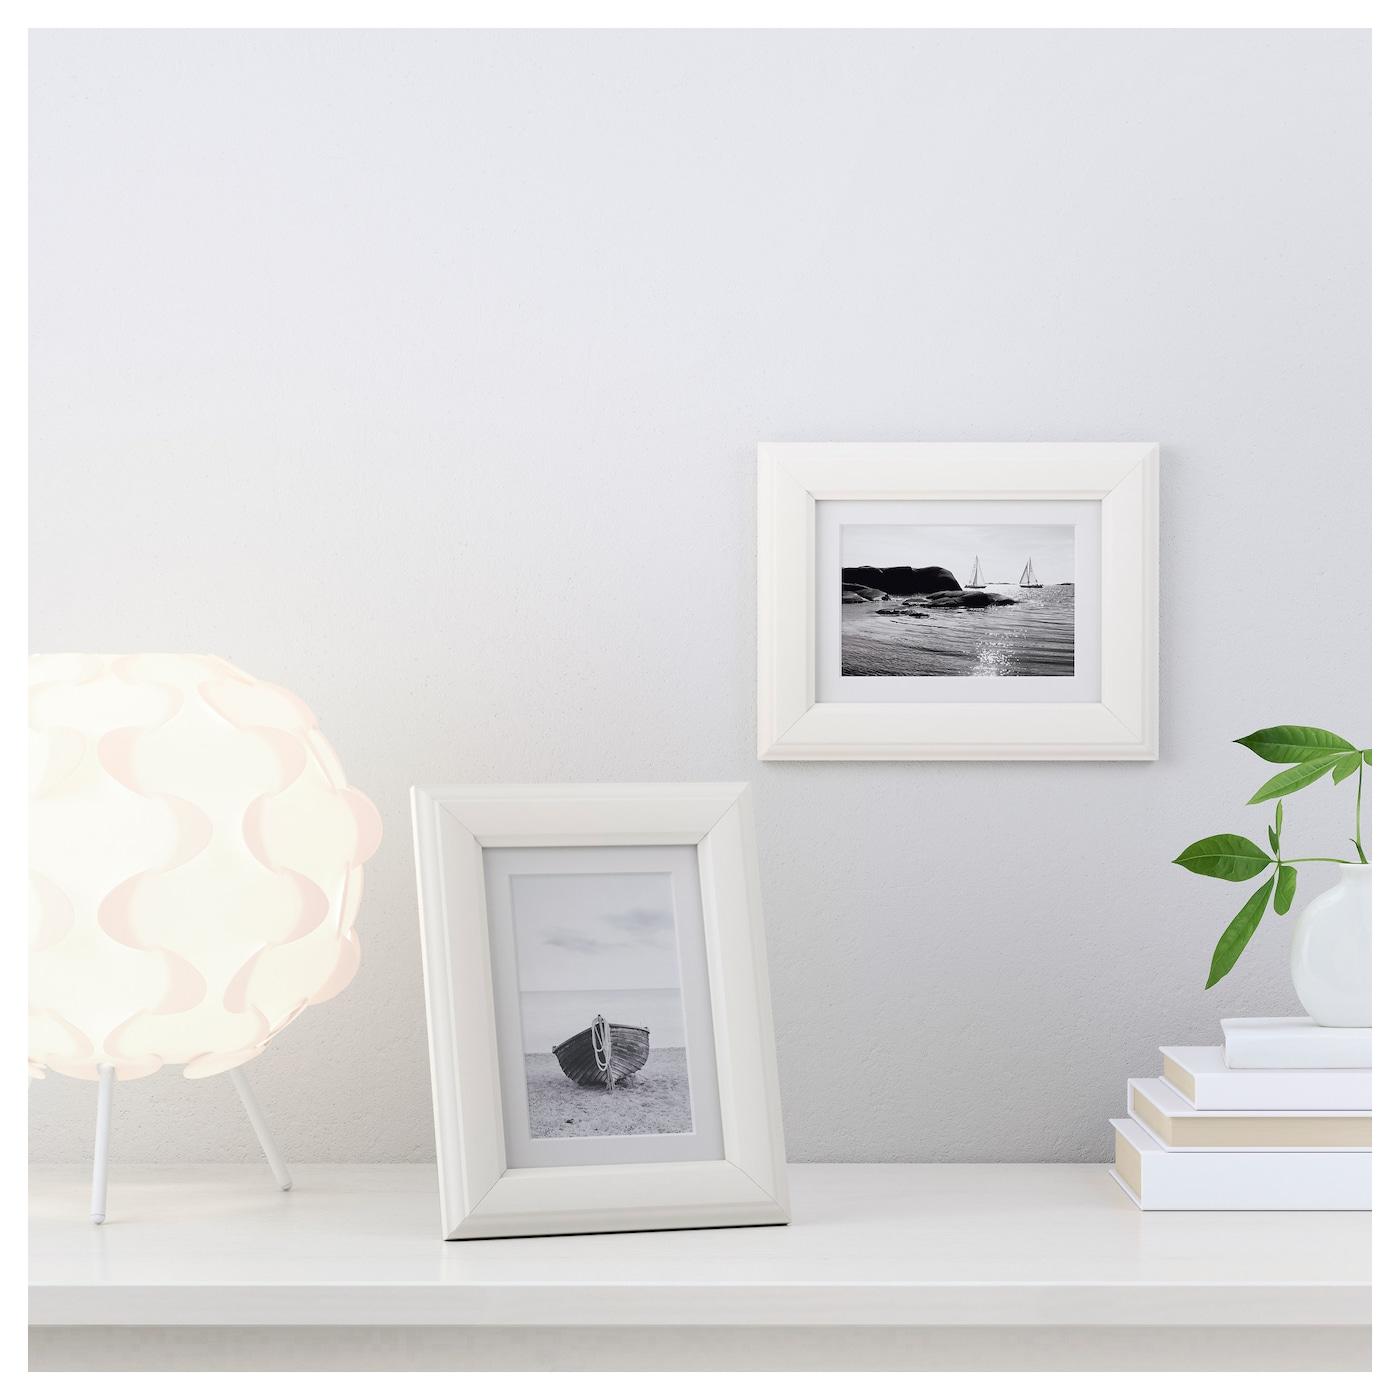 VIRSERUM Frame White 21x30 cm - IKEA